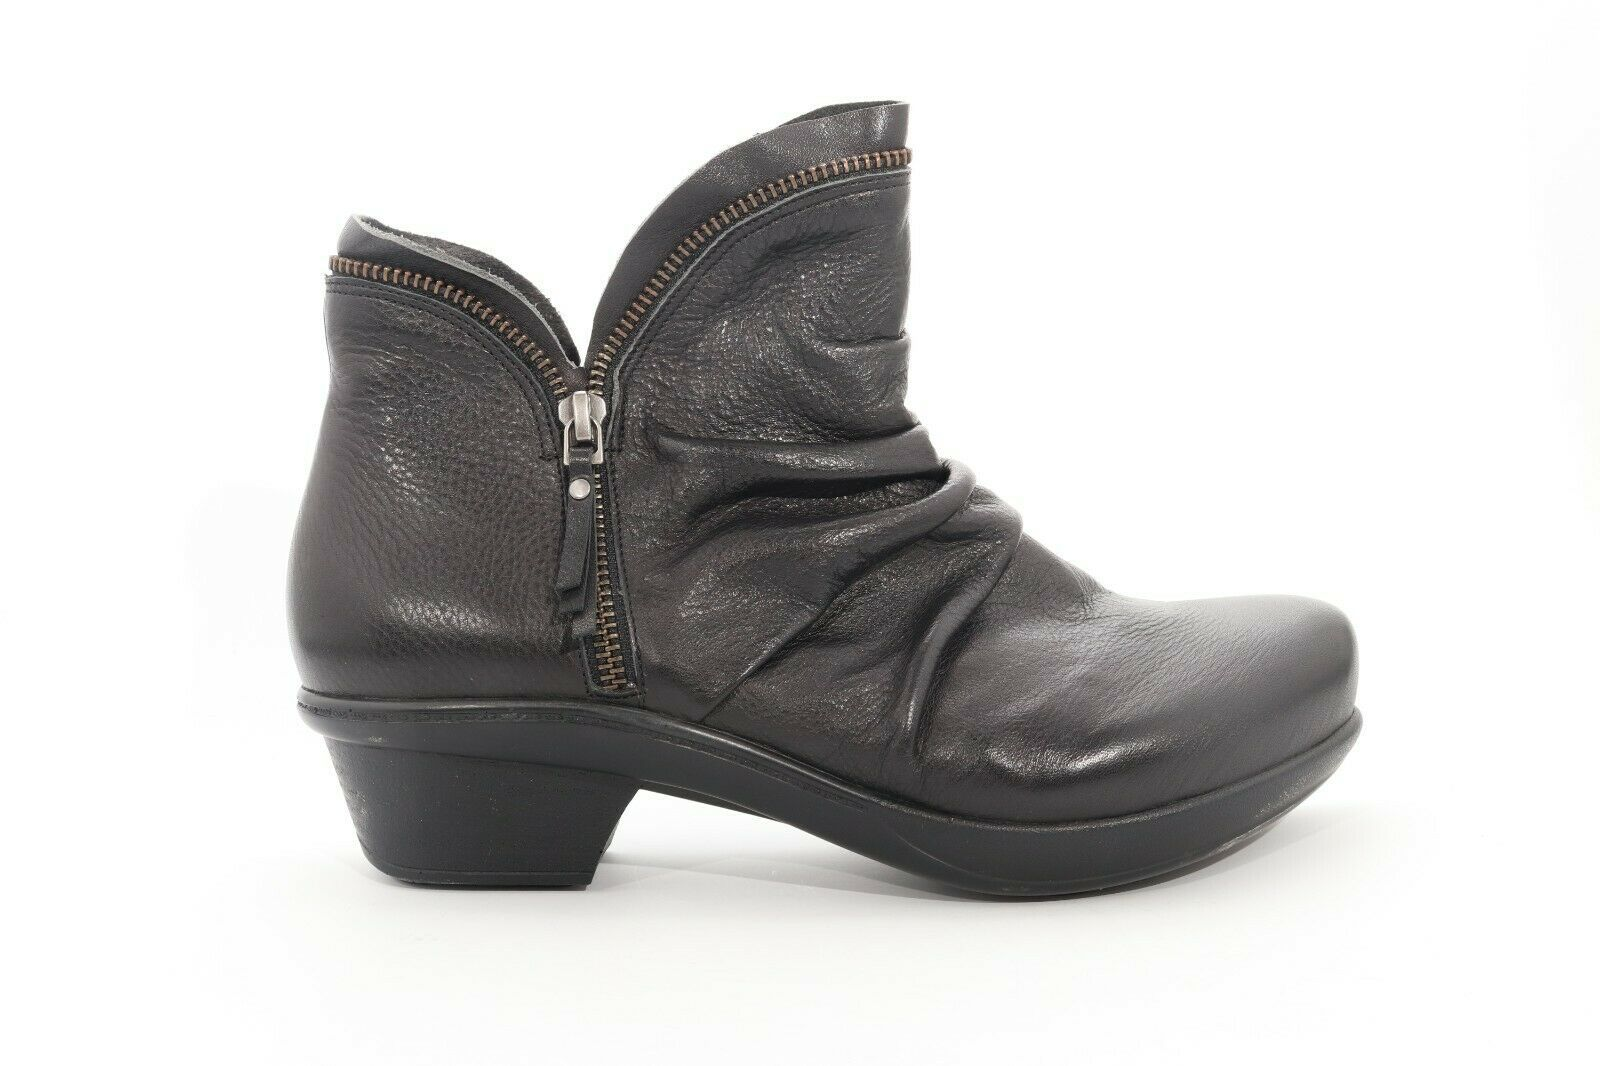 Abeo Calla  Booties  Black  Slip Resistant  Size US 8 = 5347 - $120.00